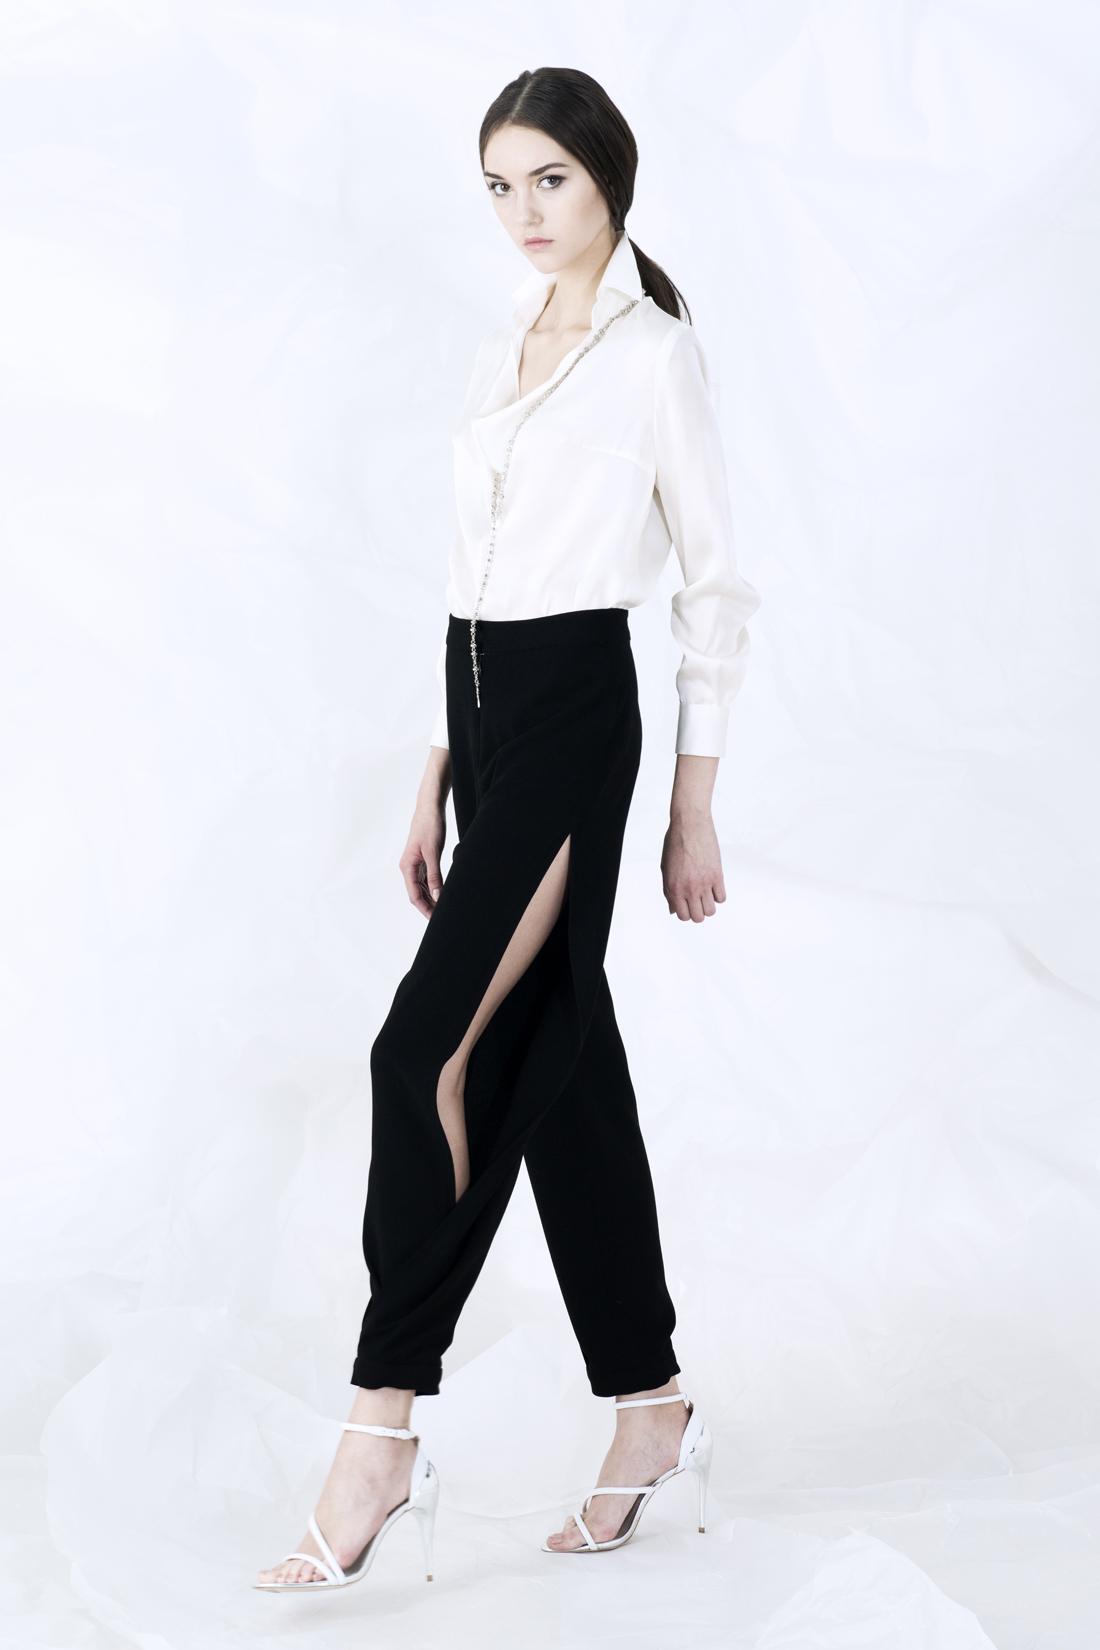 sr-vol02-greg shirt-jeannie pants.jpg